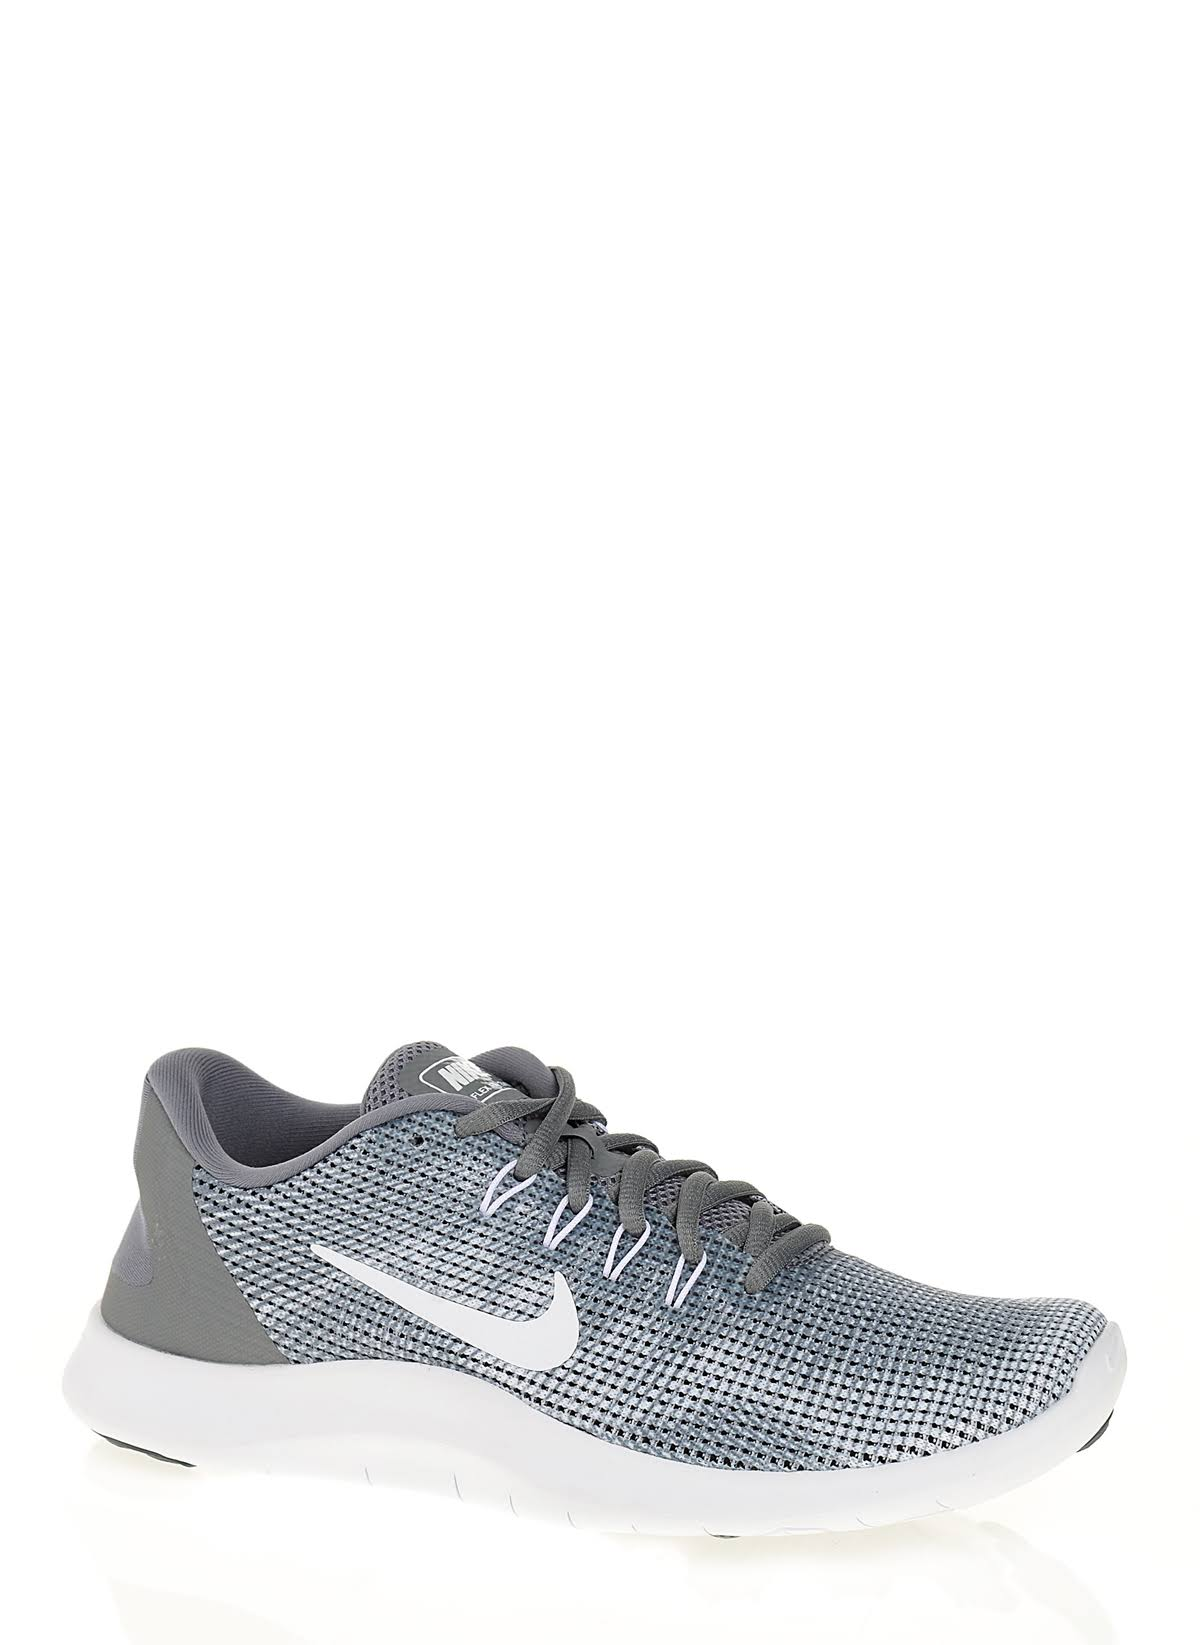 Numara 2018 Rn Kadın 5 Nike Gümüş Flex Siyah Gri 40 OUCnq